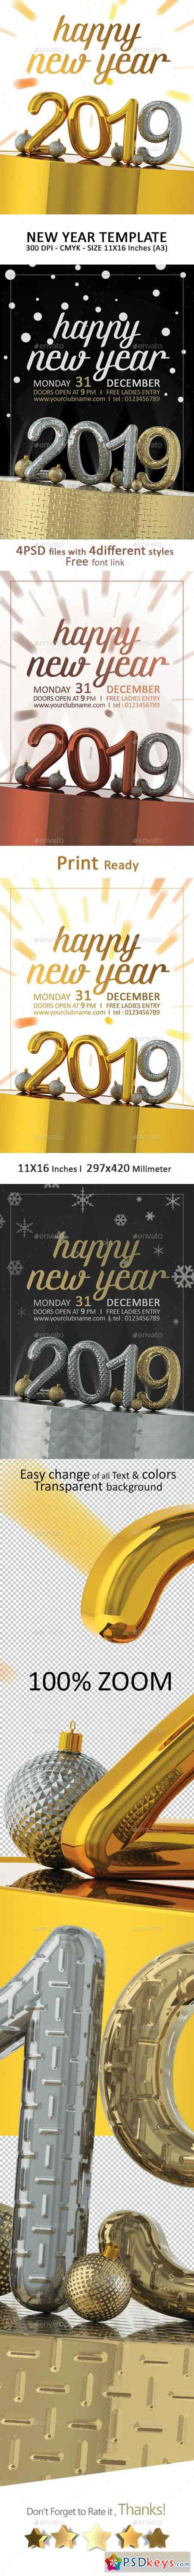 2019 Happy New Year 23057568